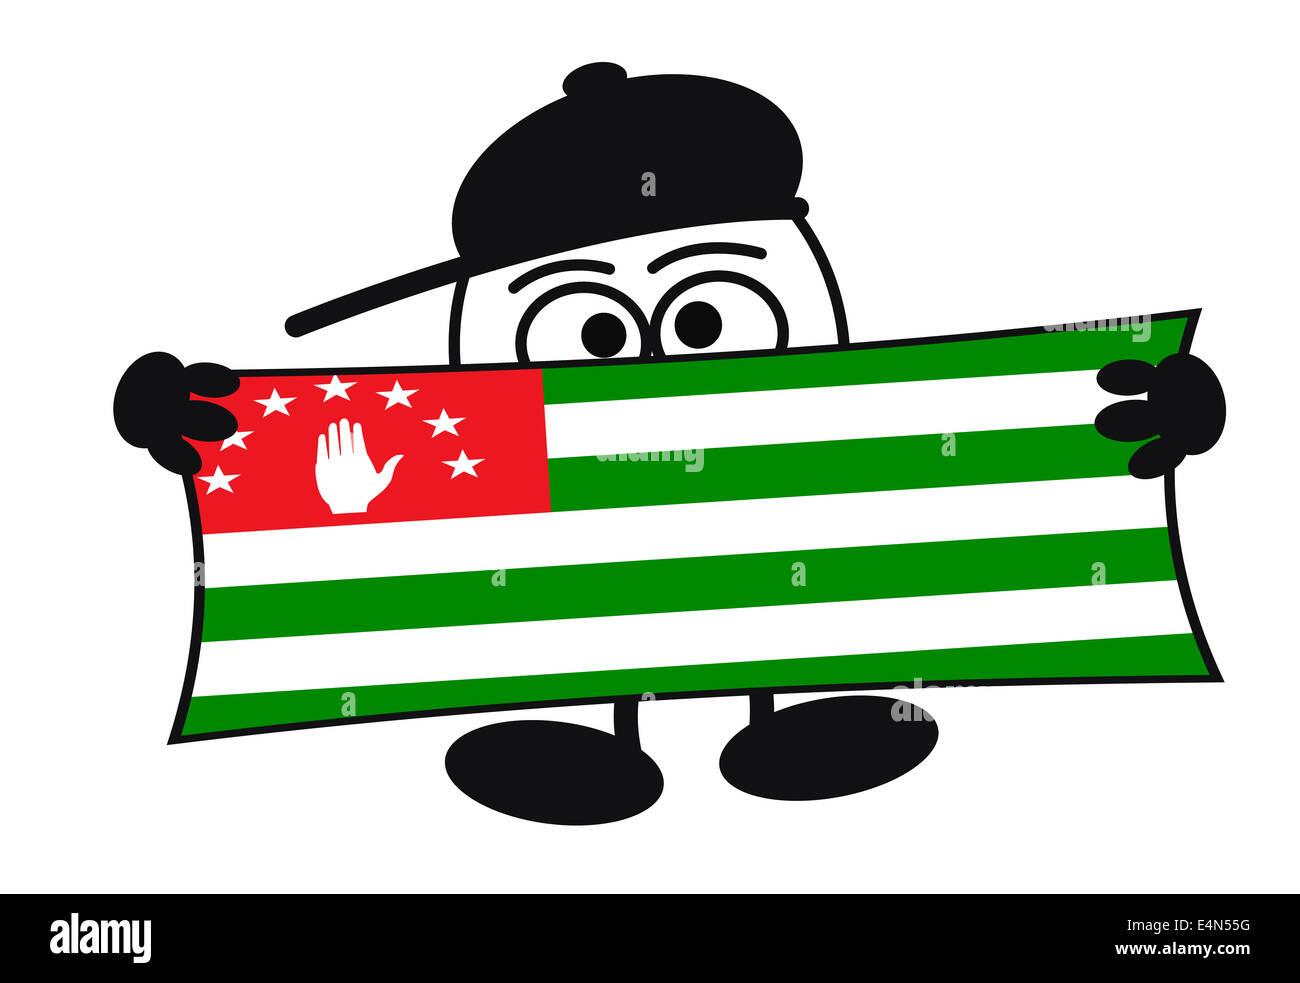 Eierkopf - Welcome Abkhazia Stock Photo